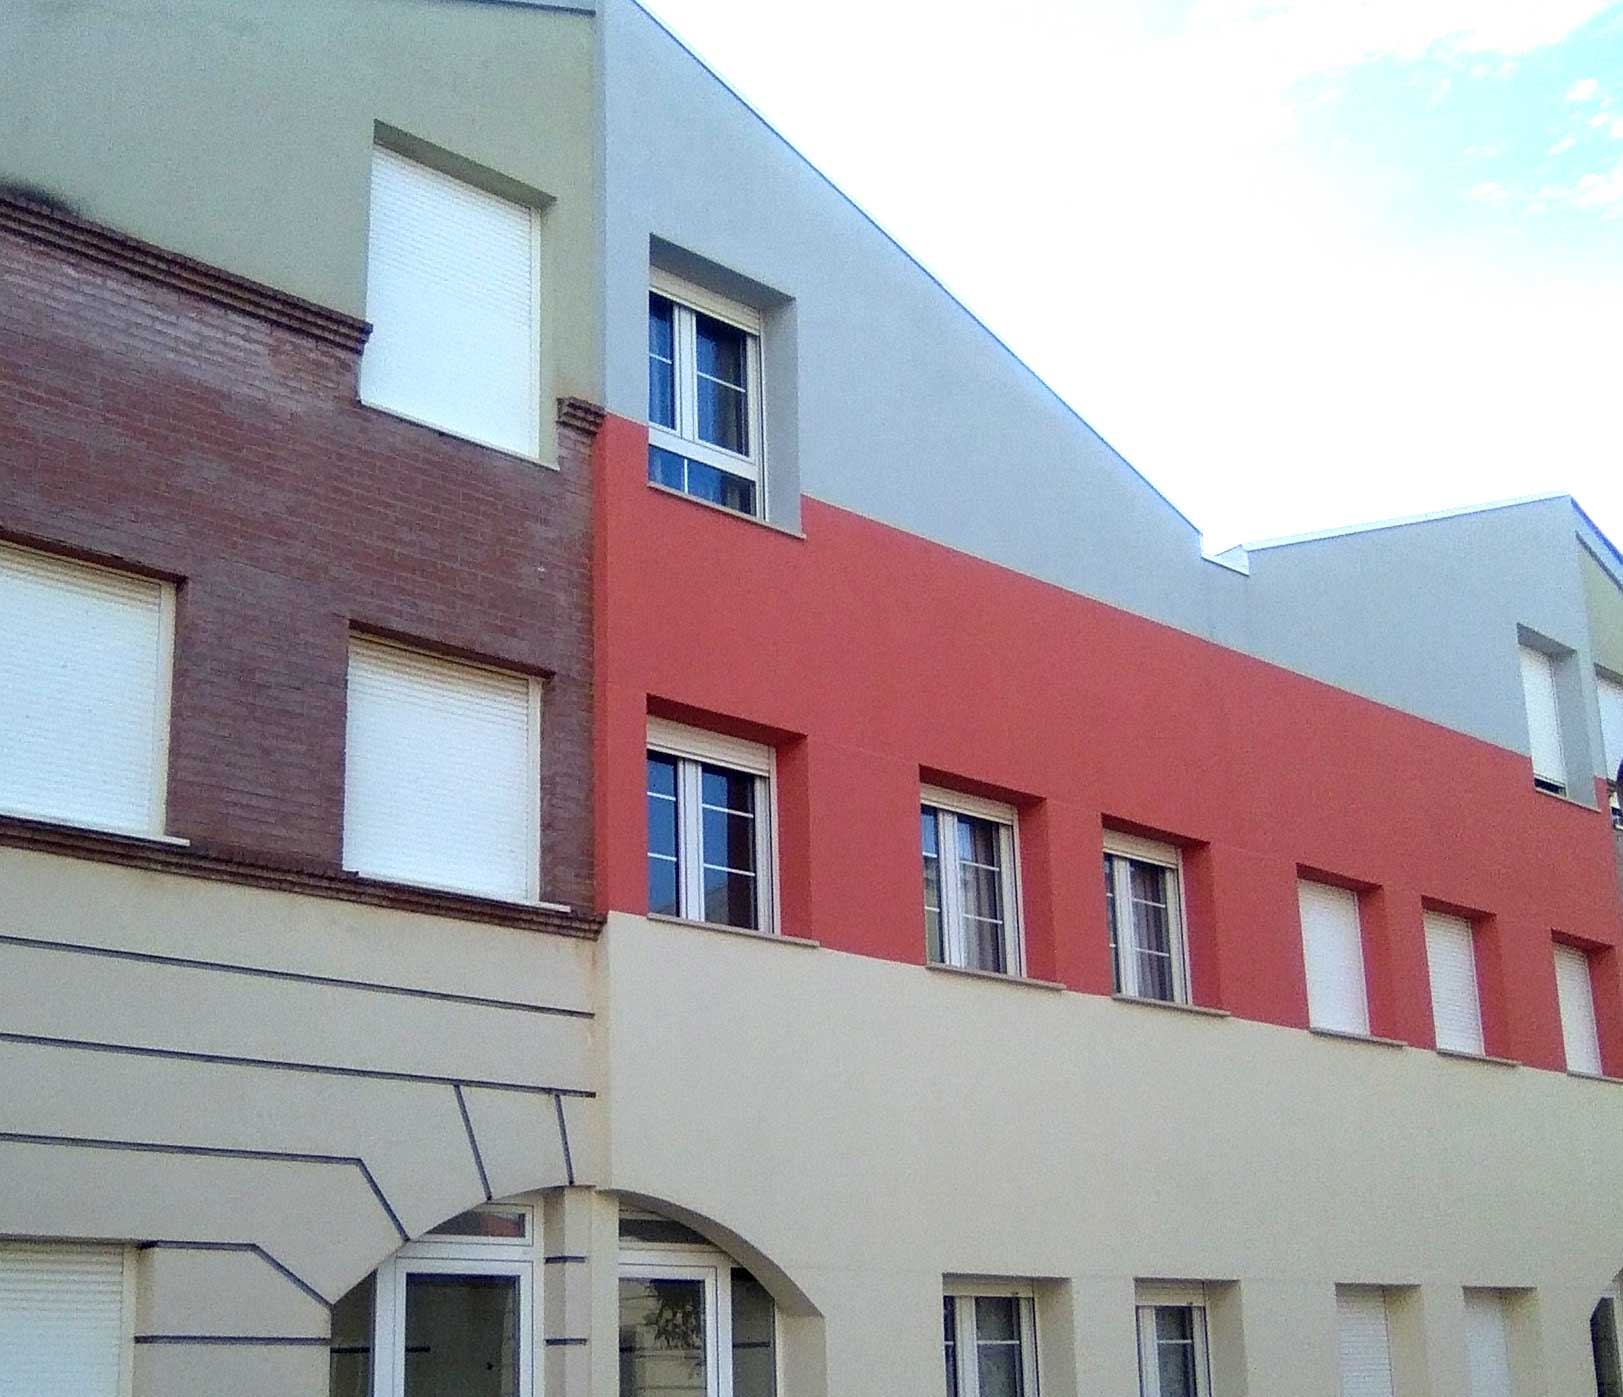 Materiales fachadas trendy fachada sp line completa los - Materiales para fachadas exteriores ...